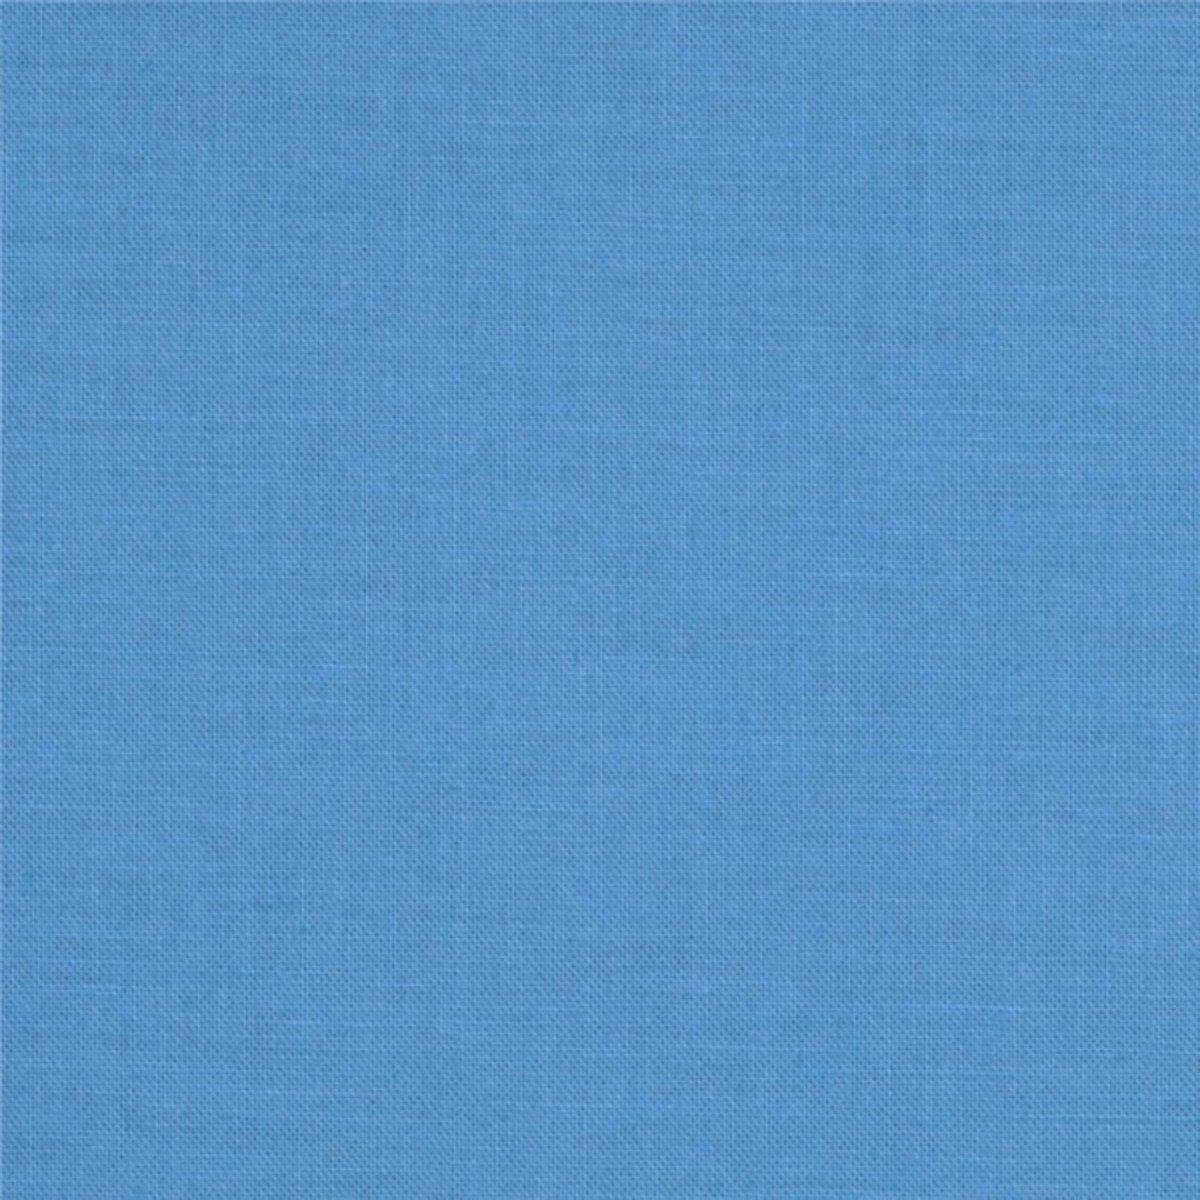 Kona Cotton in Blue Jay for Robert Kaufman